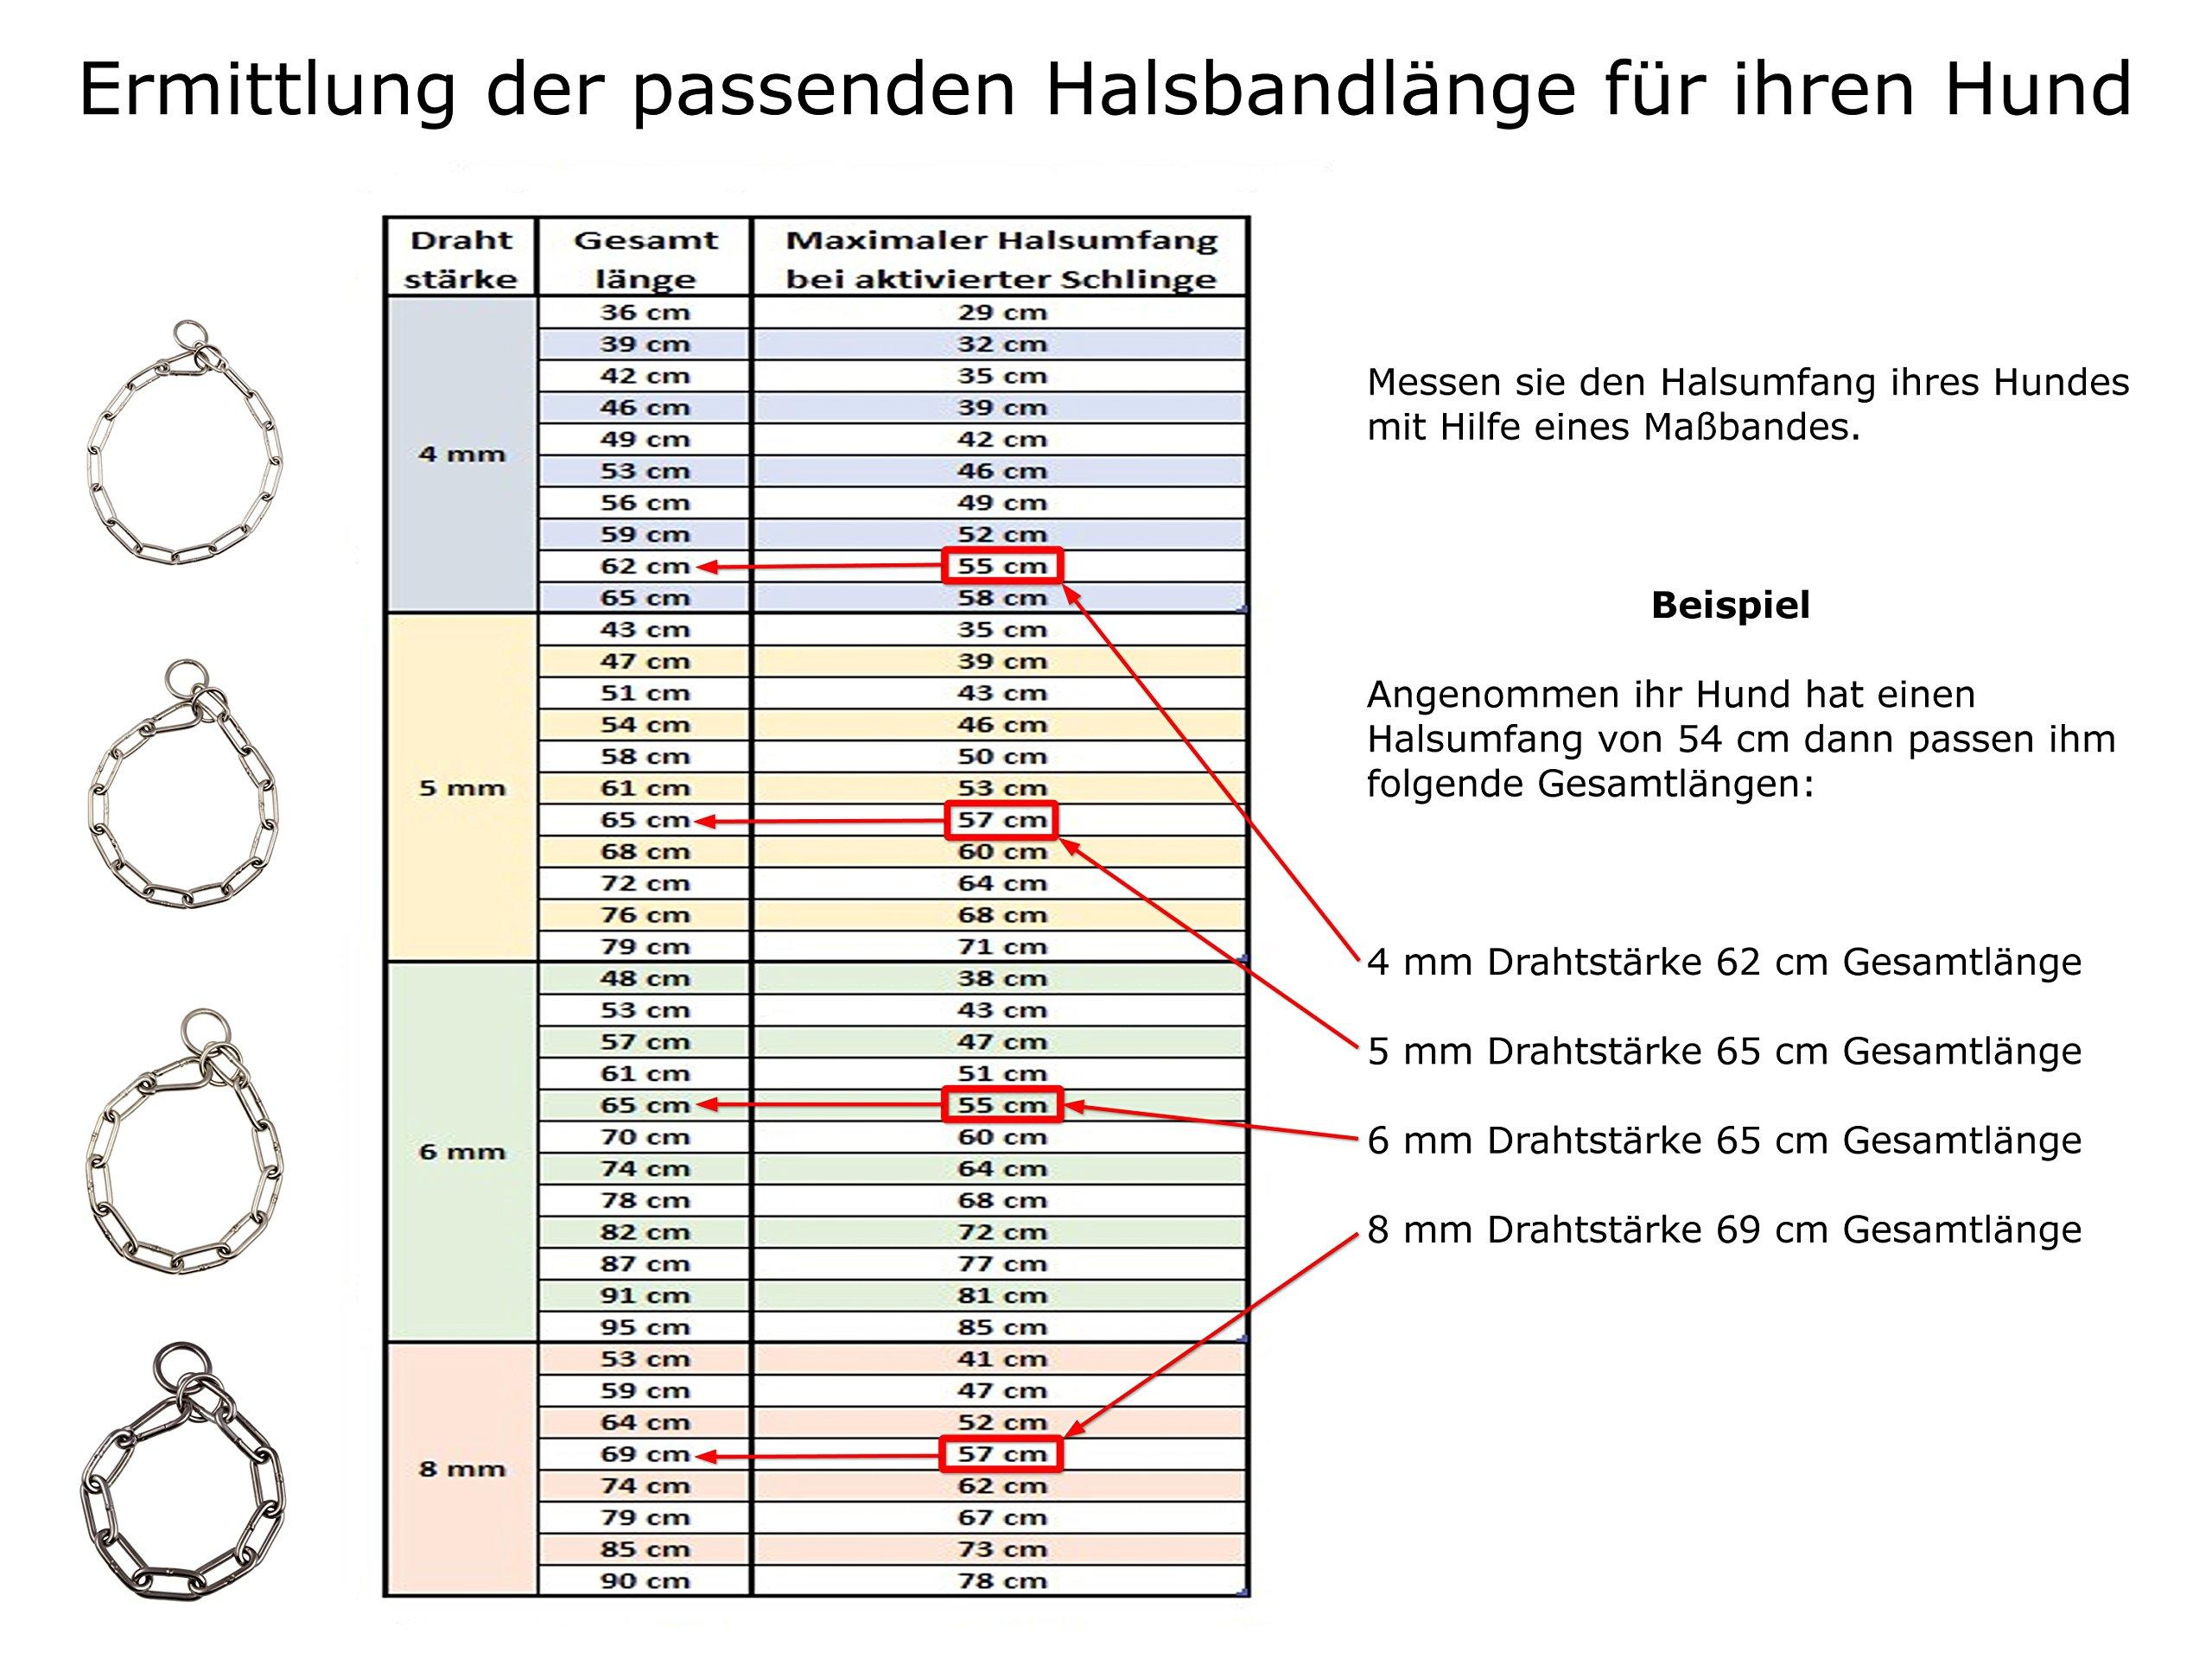 Tolle Rtd Drahtstärke Galerie - Elektrische Schaltplan-Ideen ...